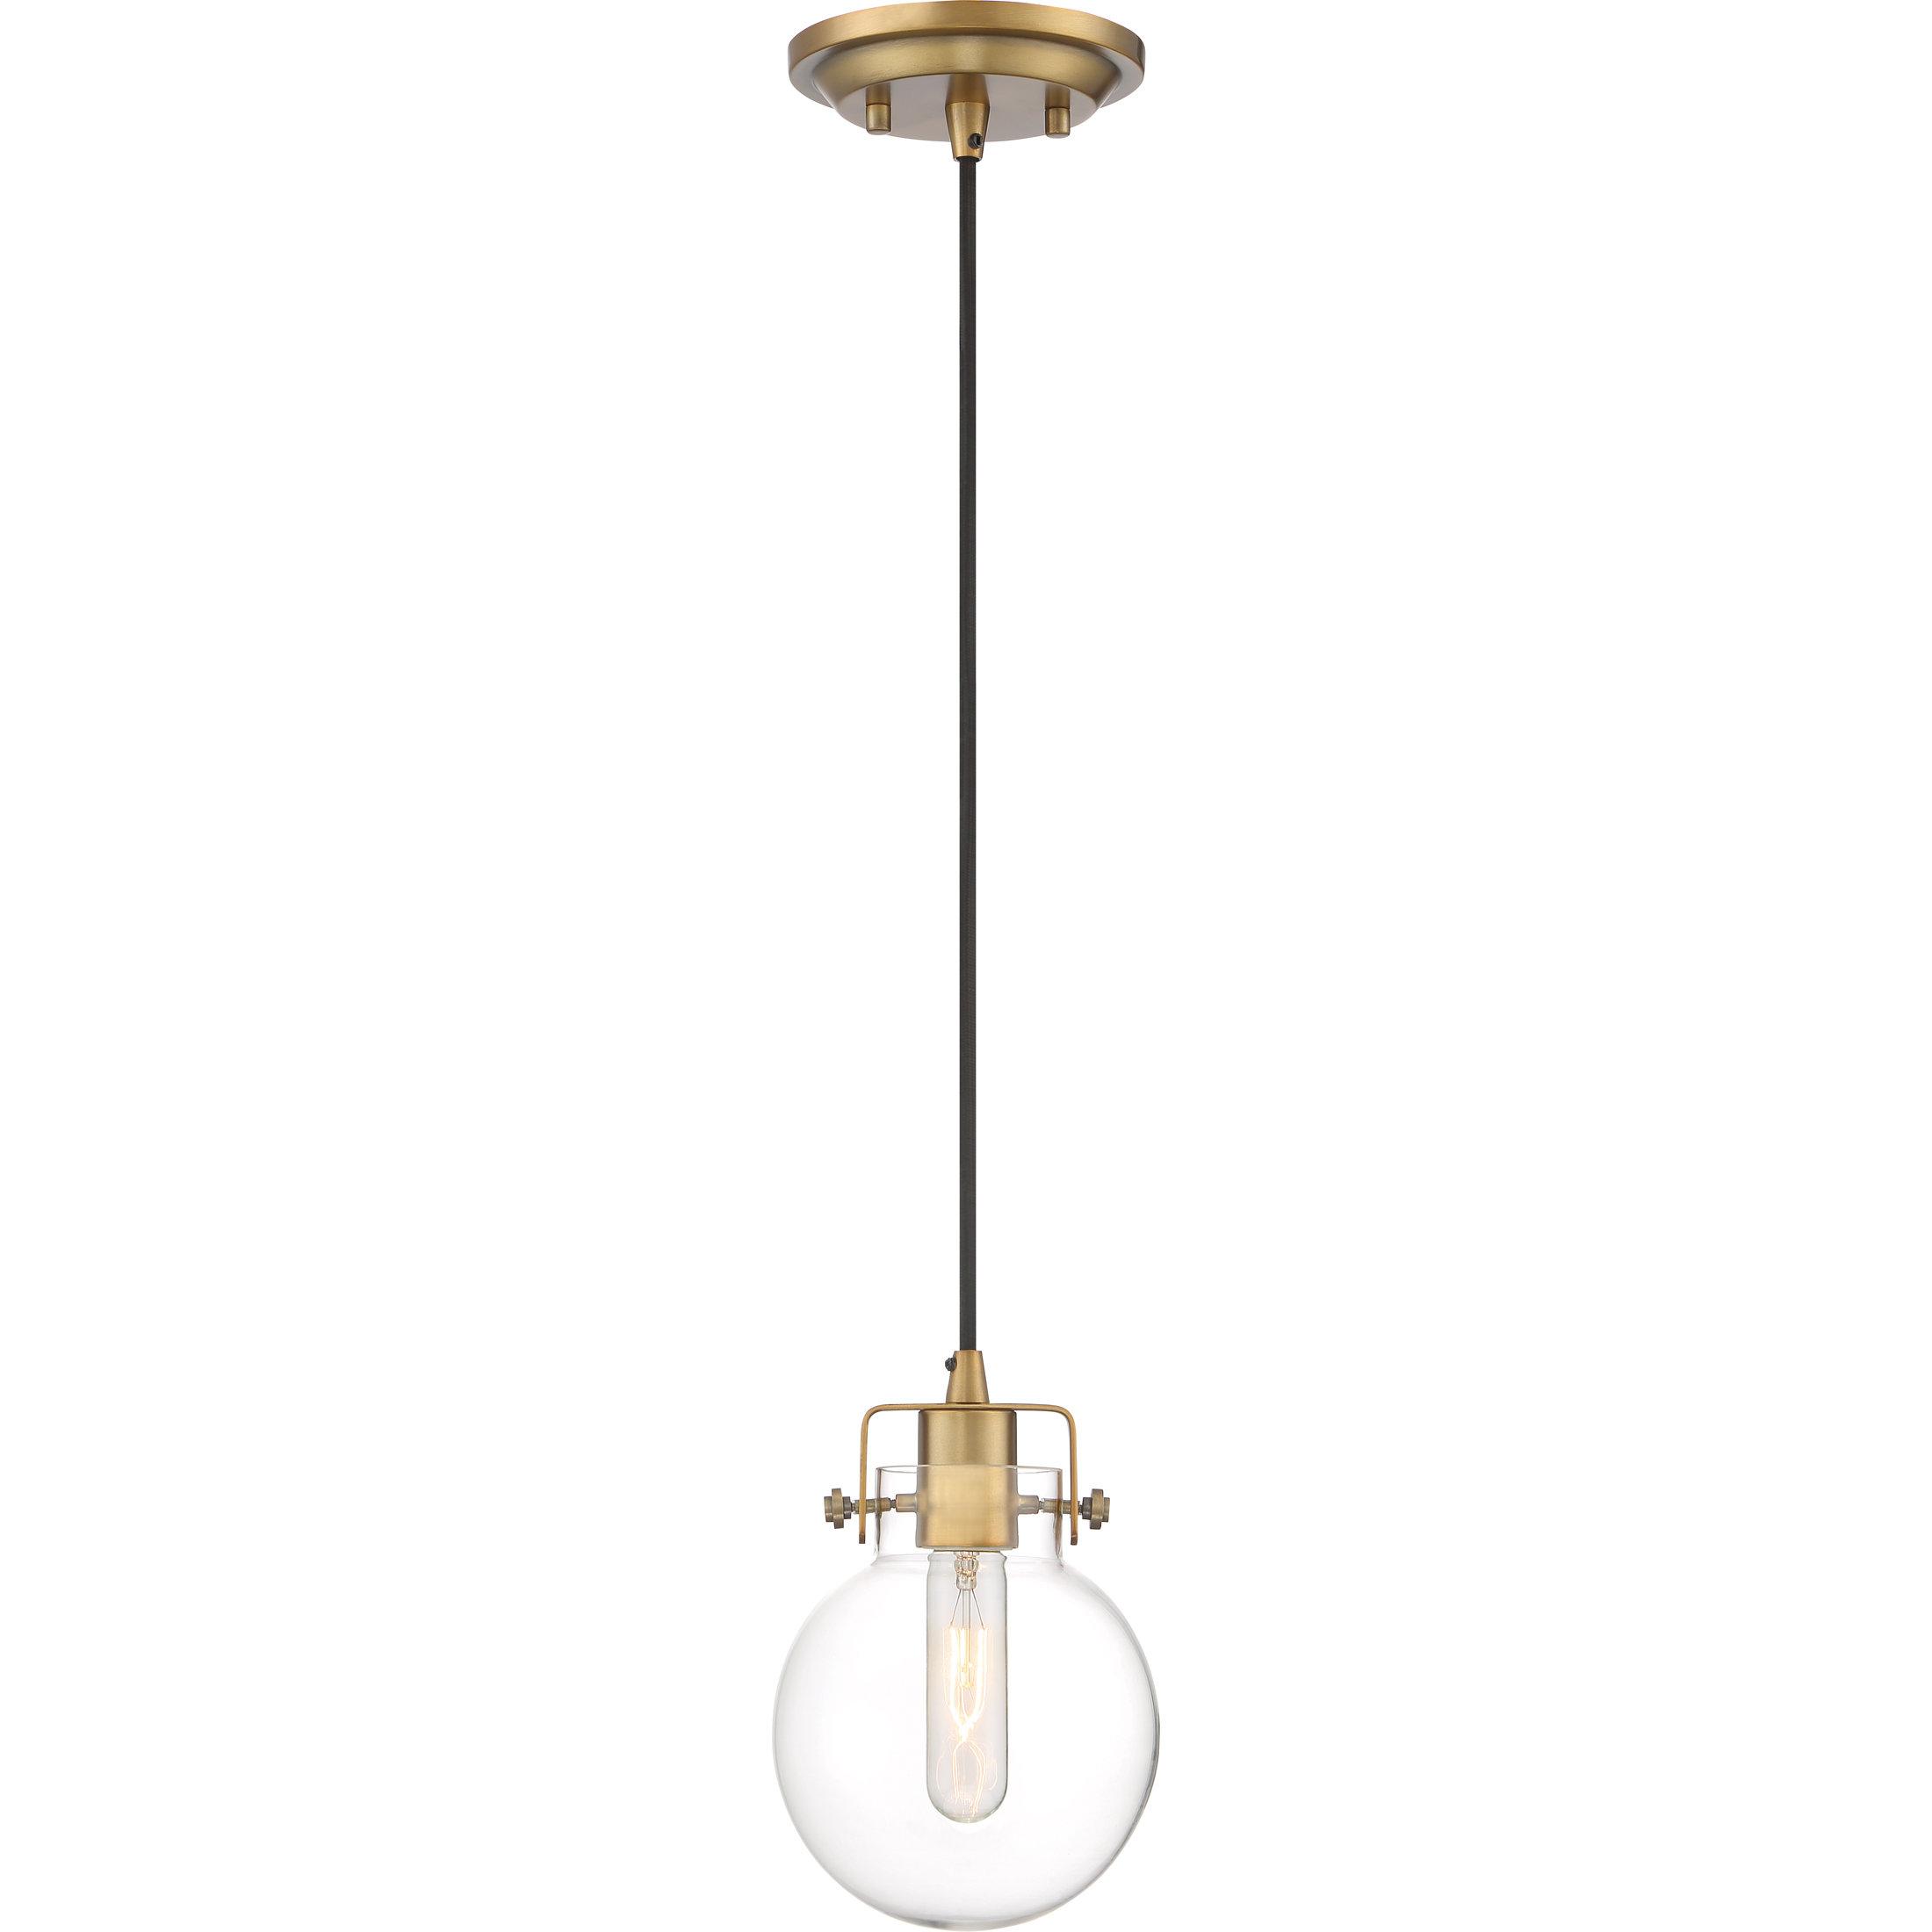 Cayden 1 Light Single Globe Pendants With Regard To Most Popular Lebron 1 Light Single Globe Pendant (View 11 of 25)